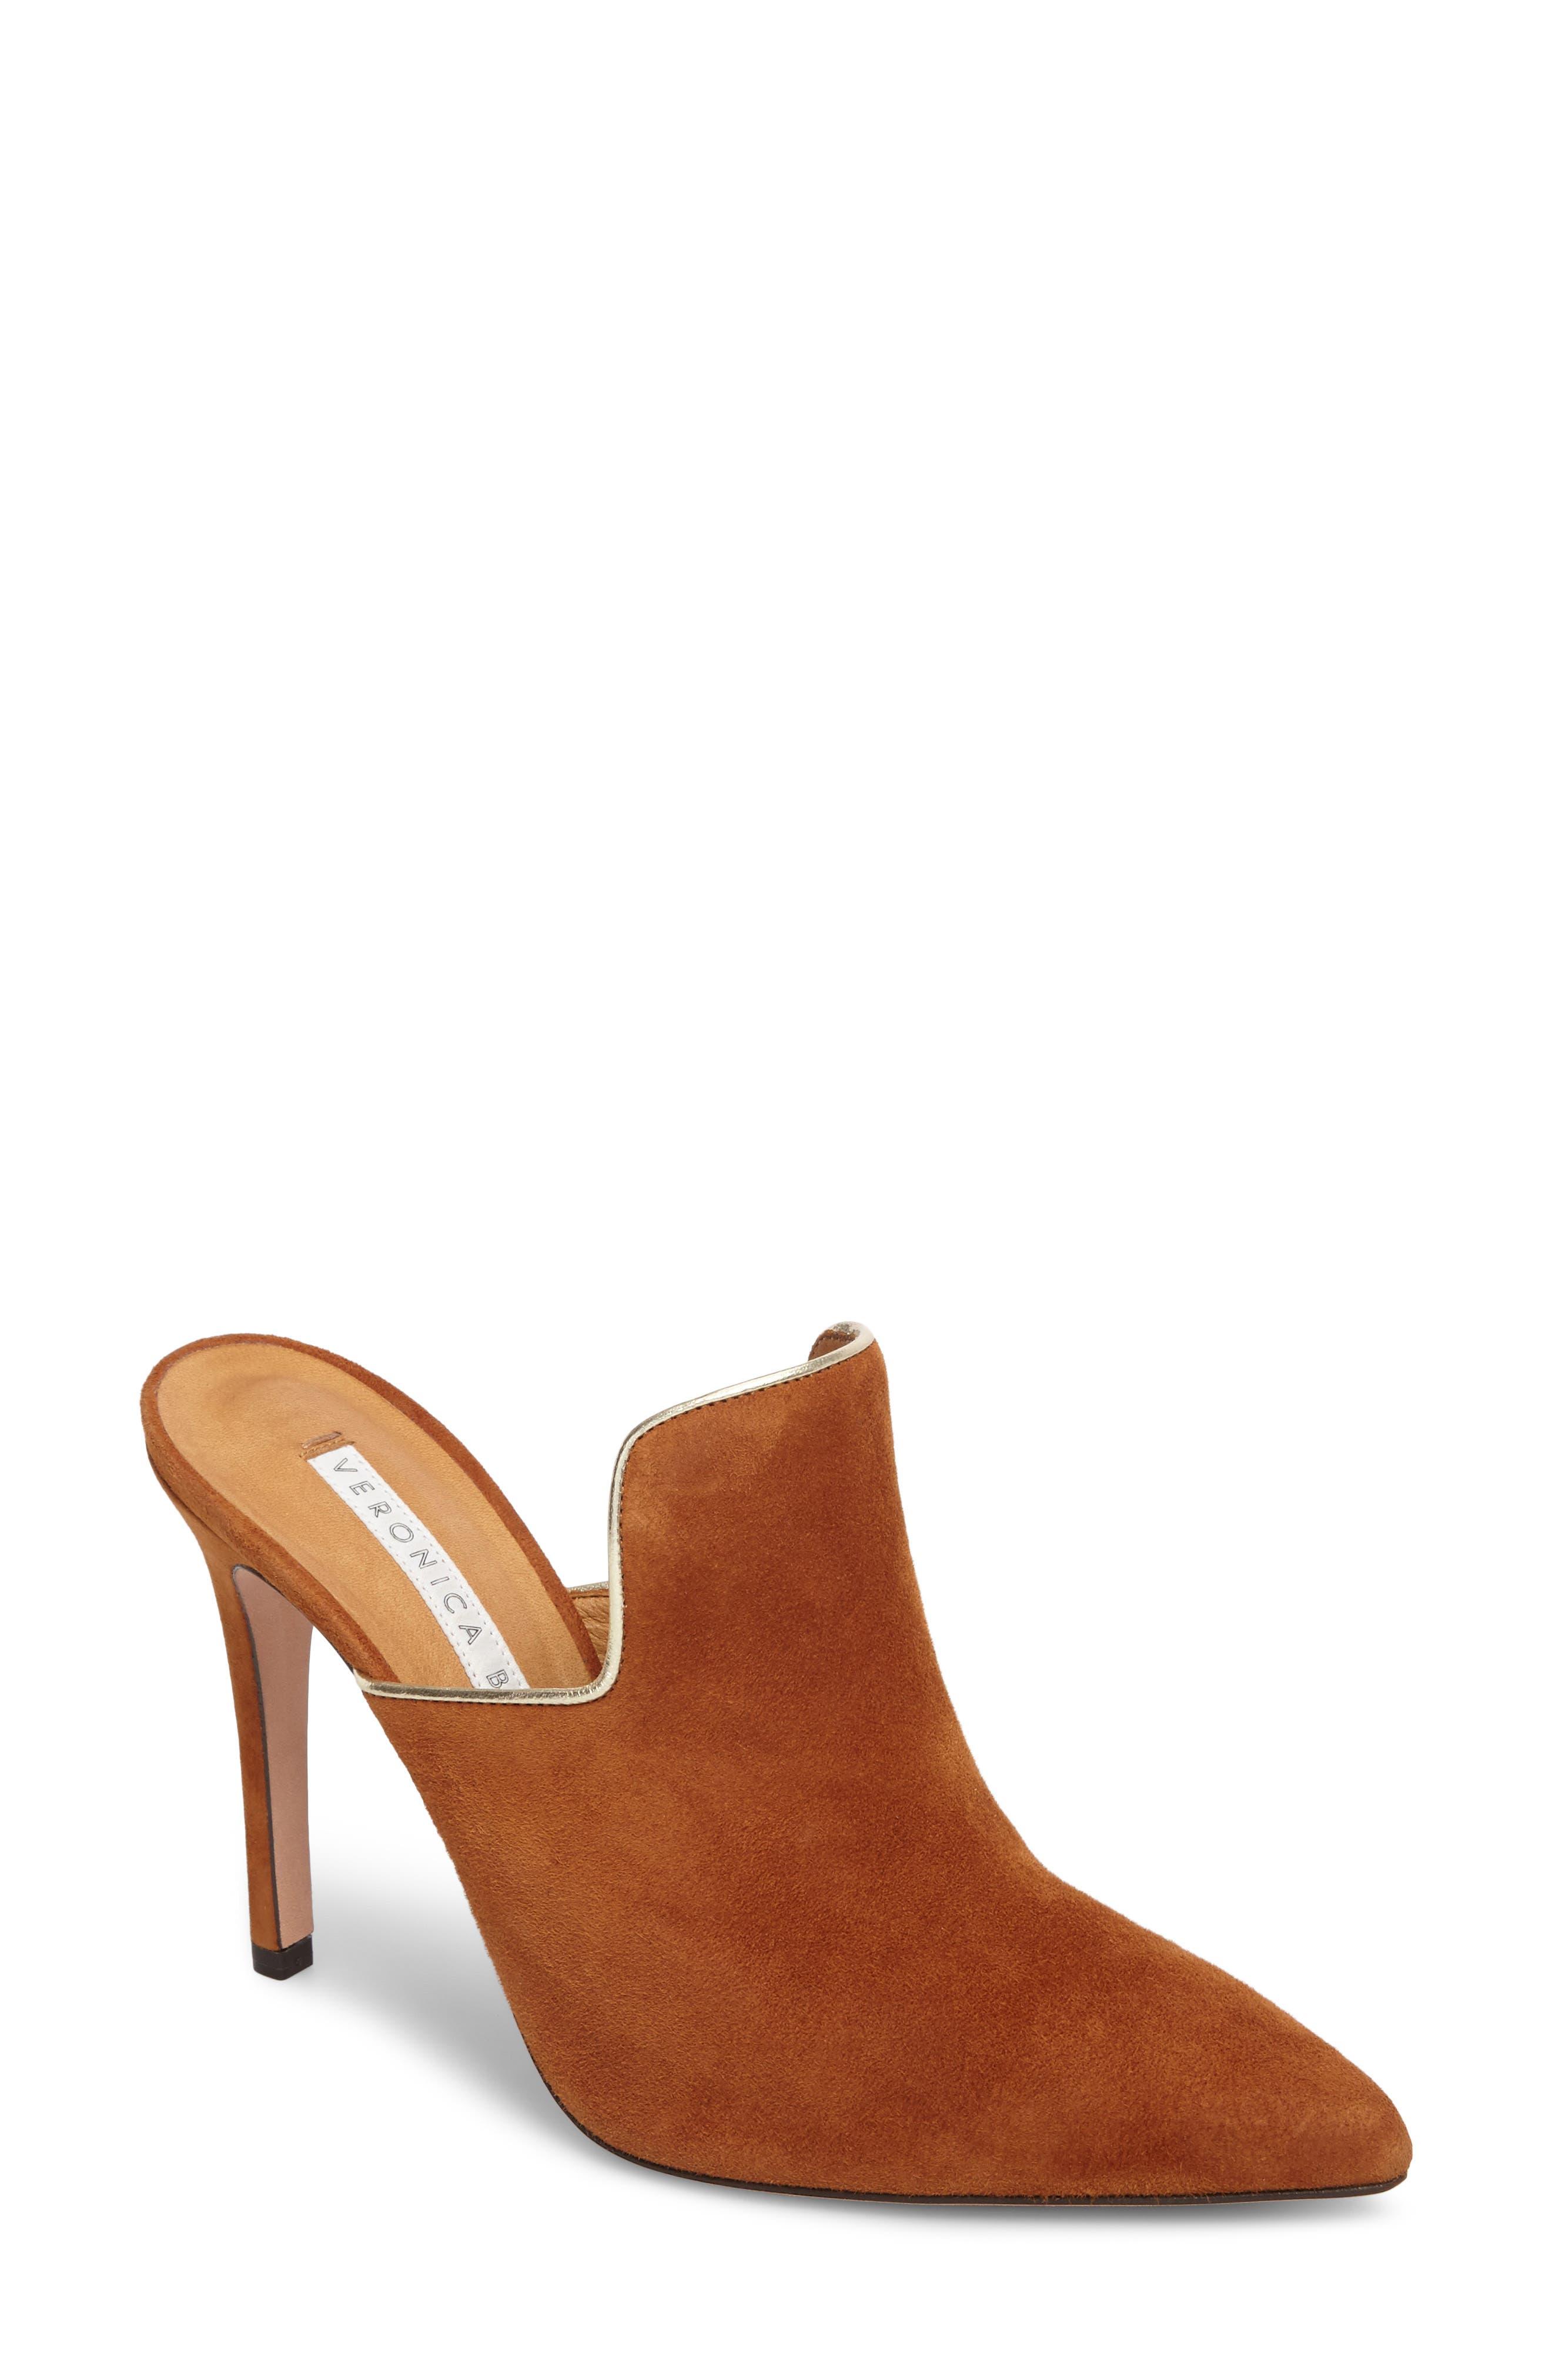 Alternate Image 1 Selected - Veronica Beard Penn Pointy Toe Mule (Women)